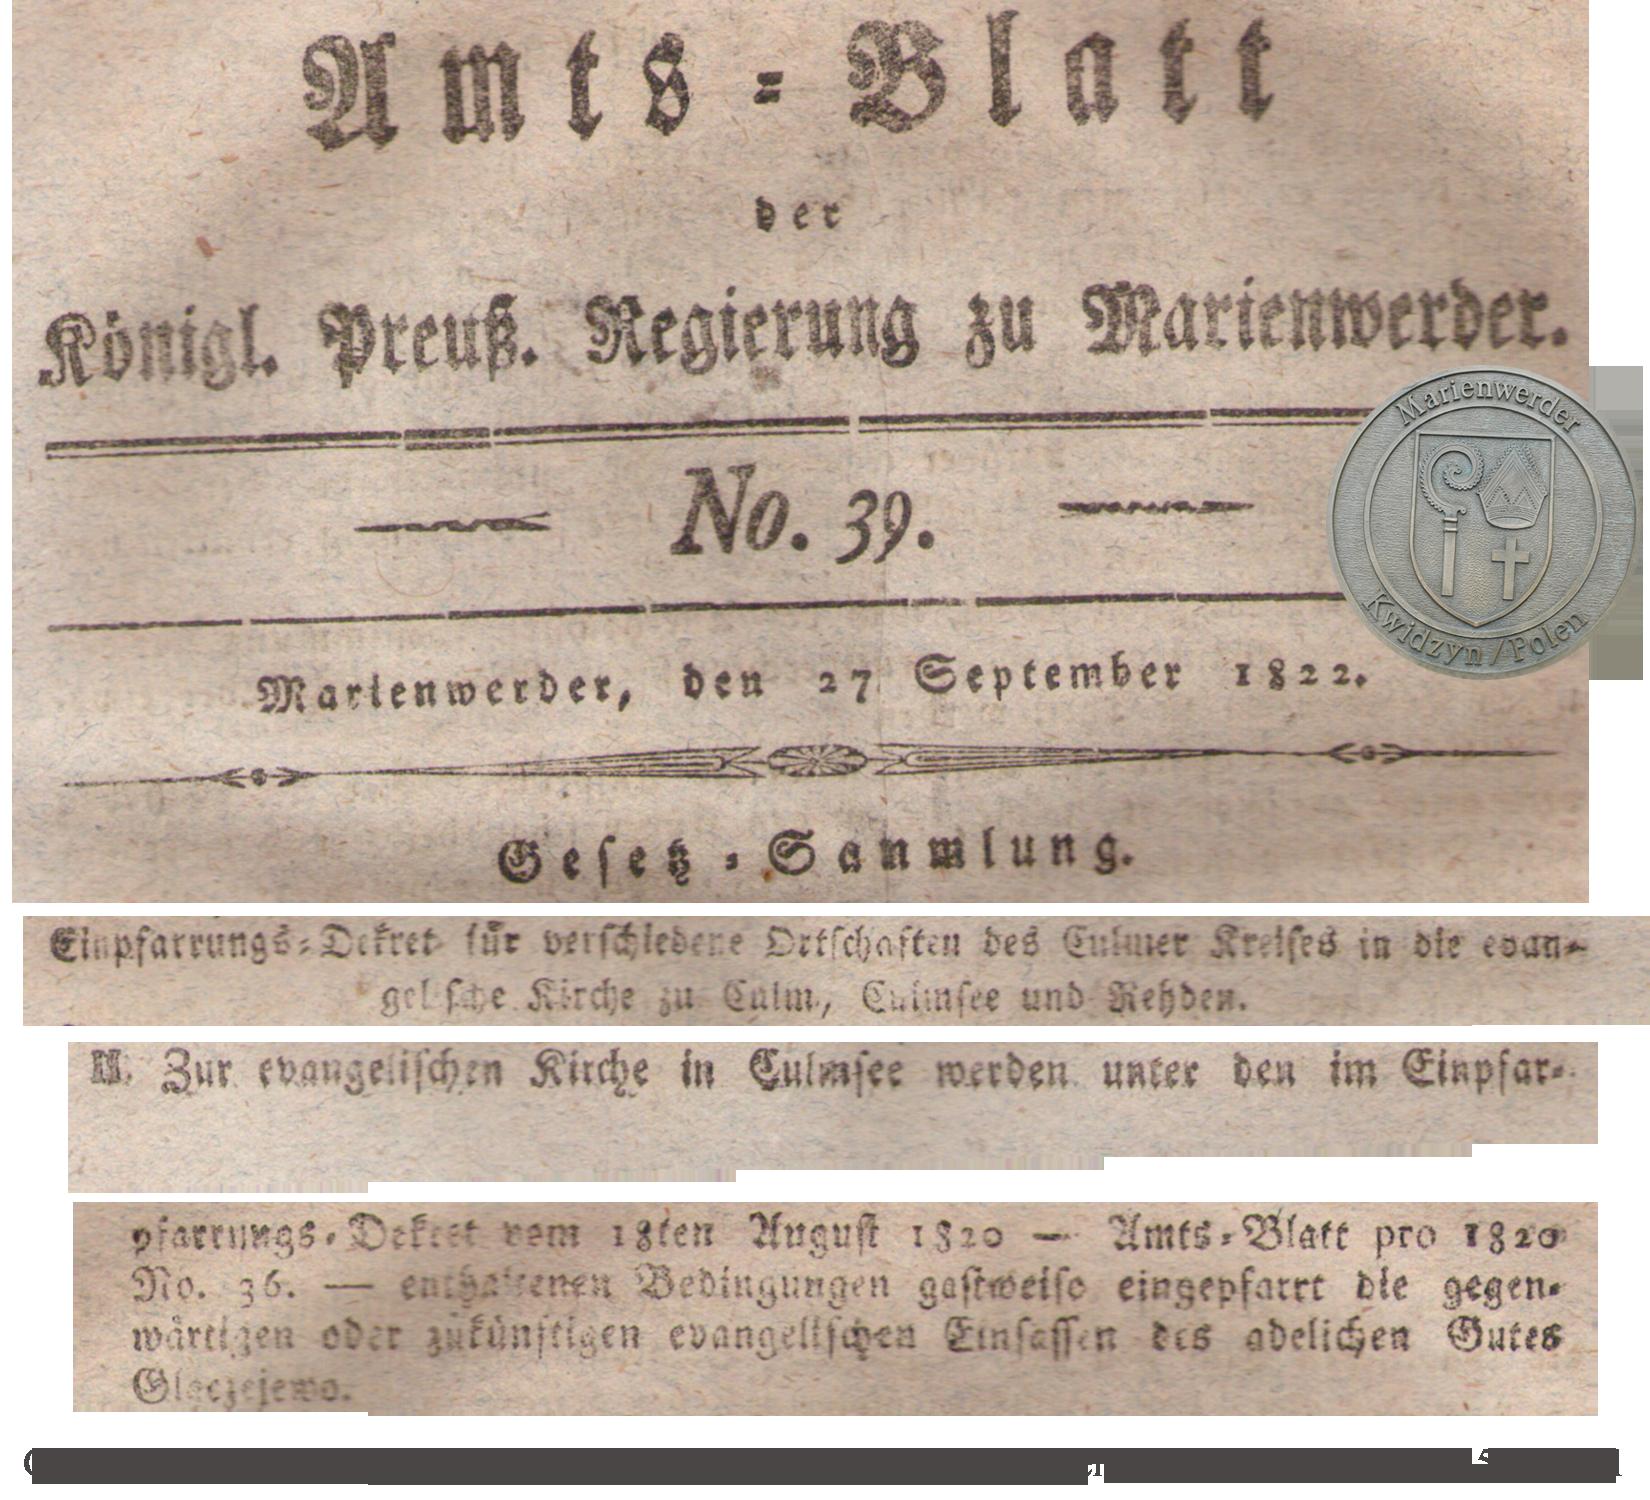 Amts-Blatt Königlich Preuss. Regierung zu Marienwerder 27.9.1822 Ausschnitte